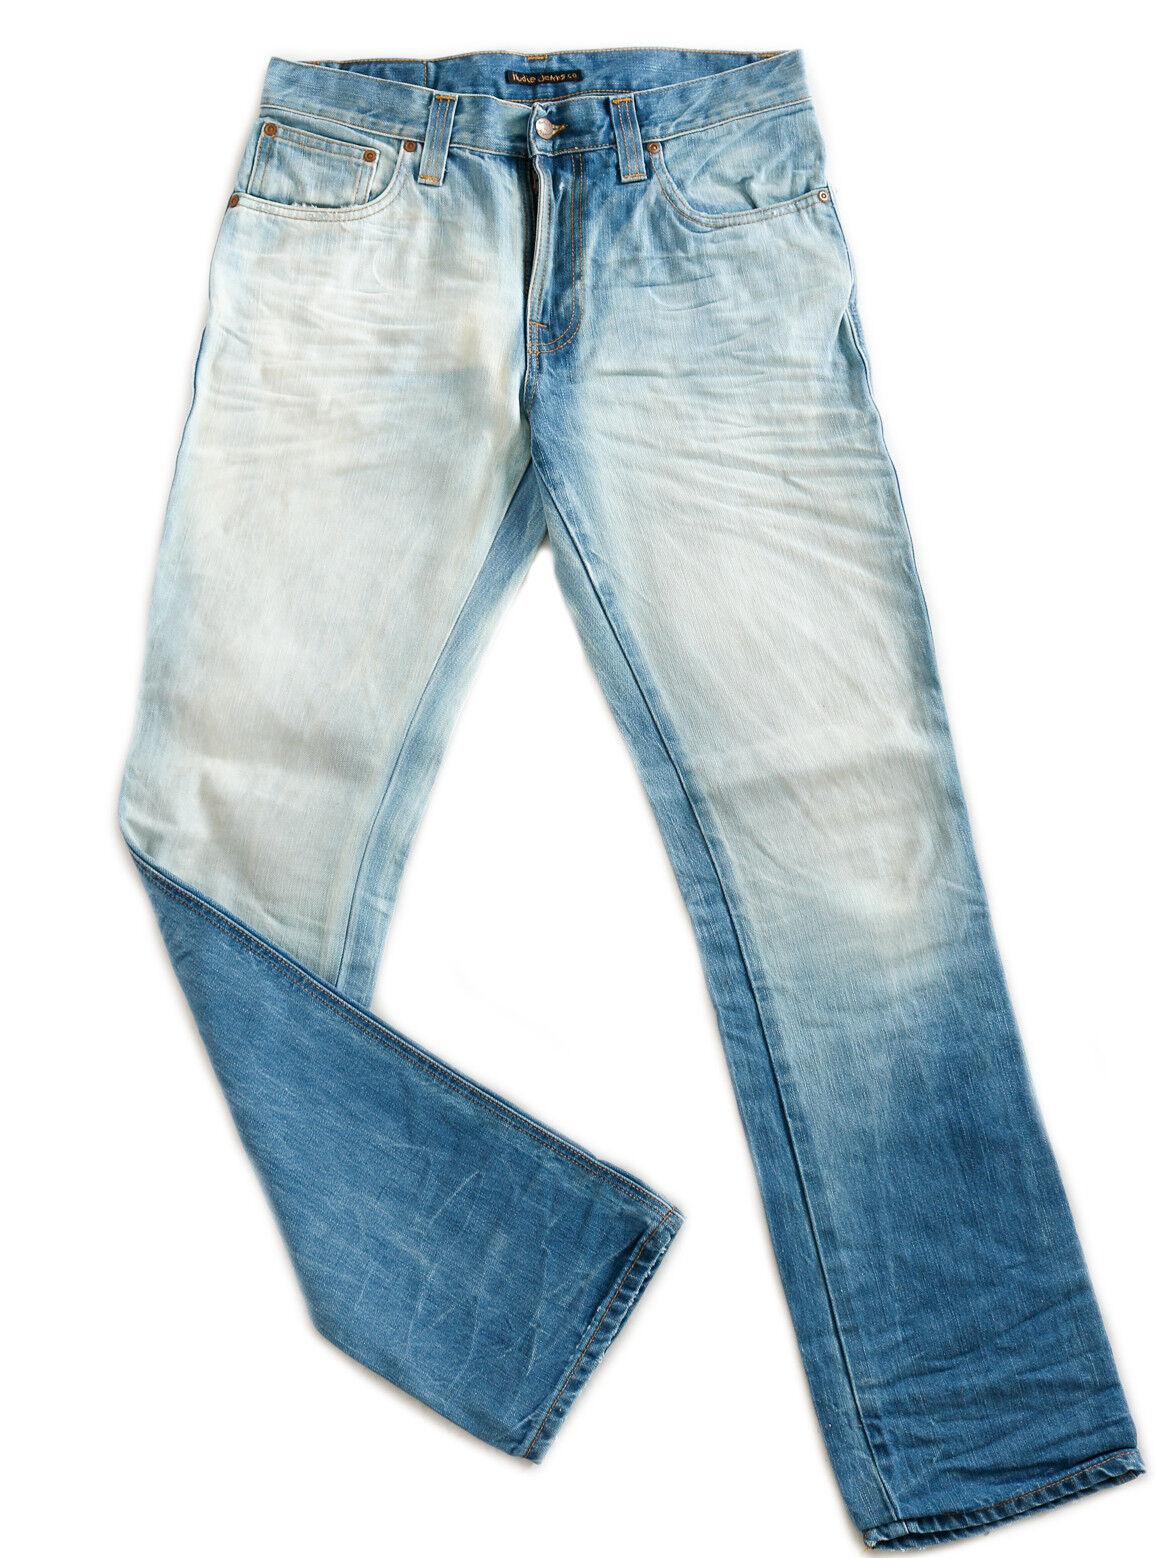 Nudie Men's Jeans Trousers Slim Jim Straight Fit bluee W32 W33 L34